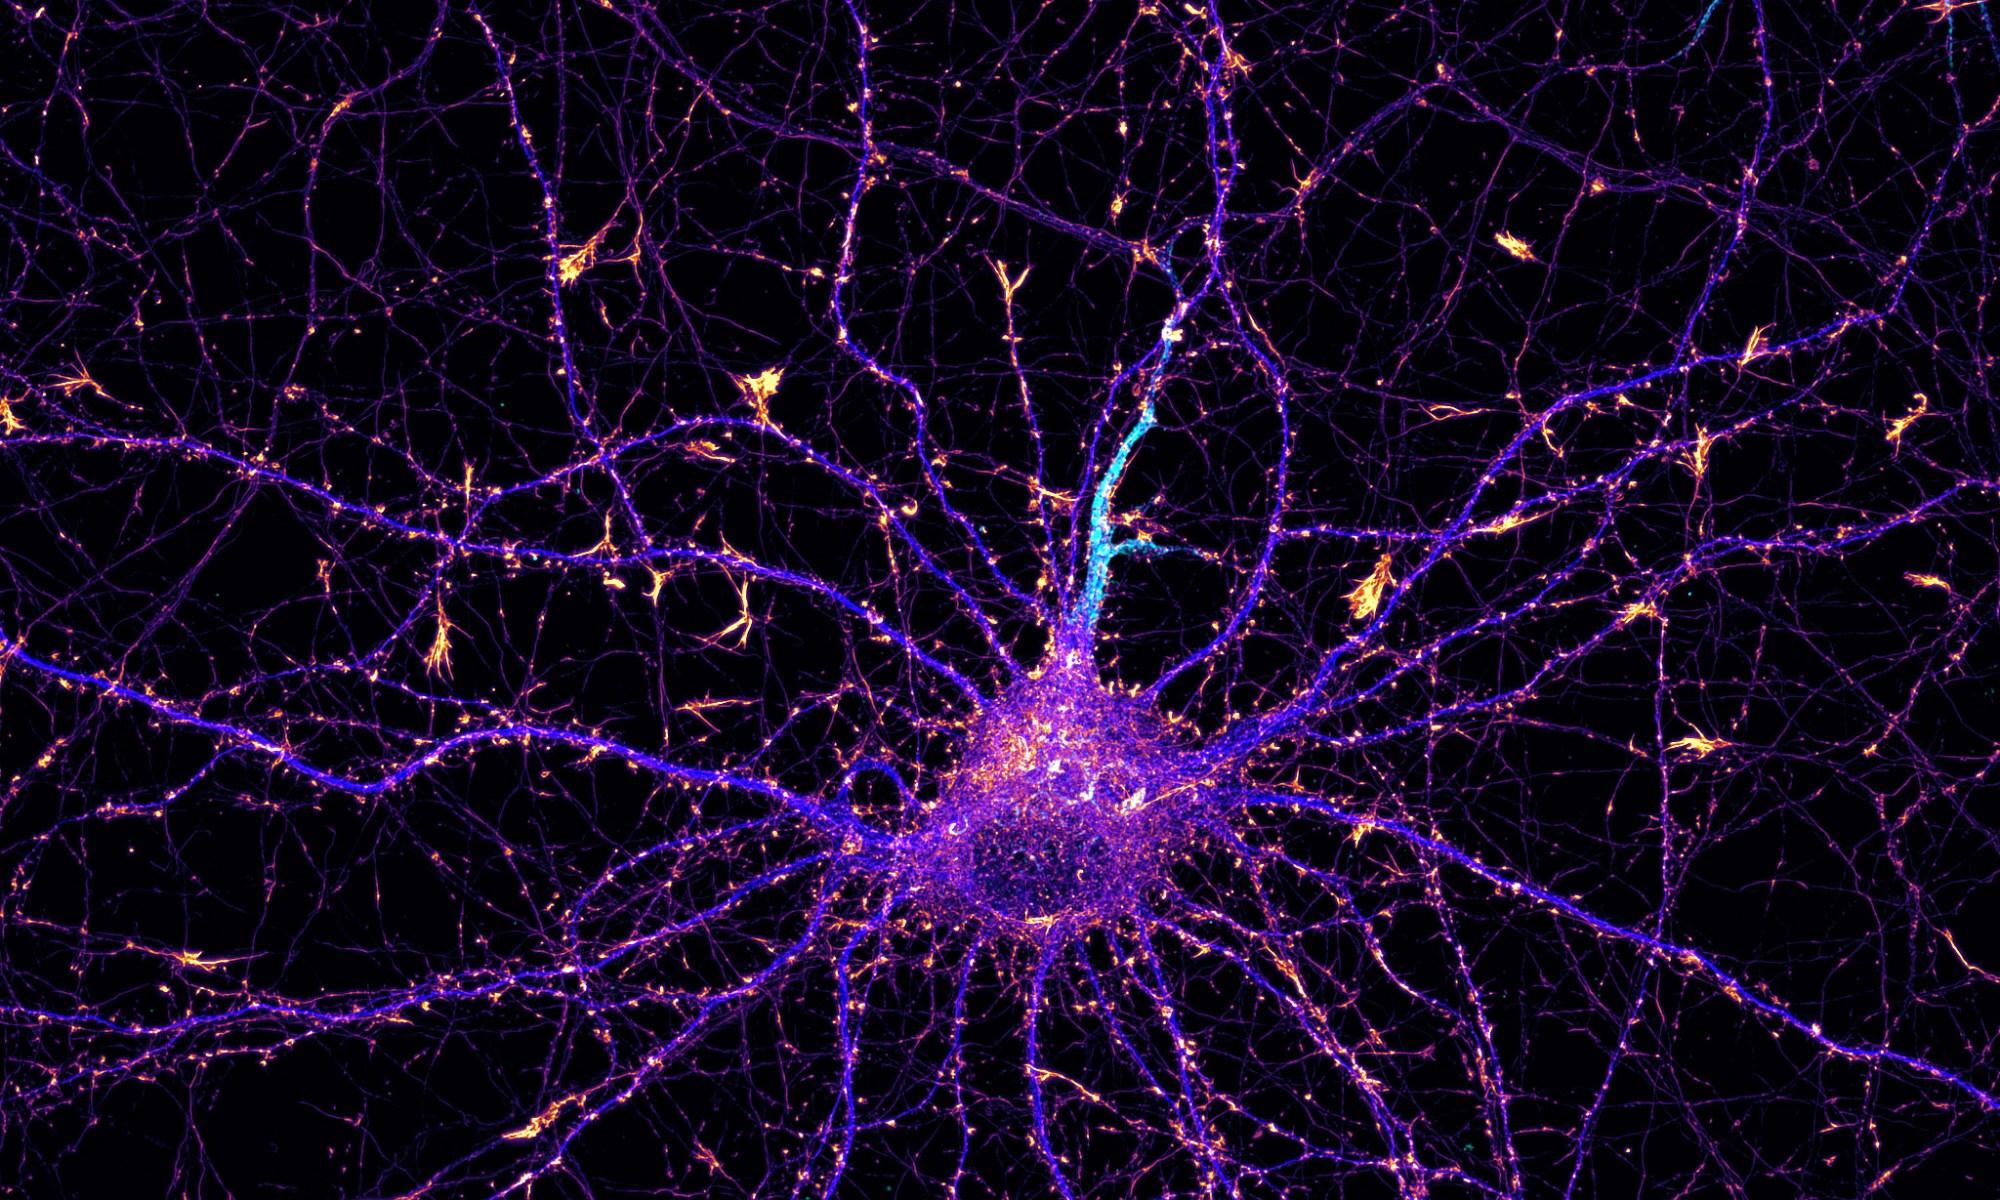 Hippocampal neuron labeled for actin (fire), map2 (blue) and neurofascin (cyan)